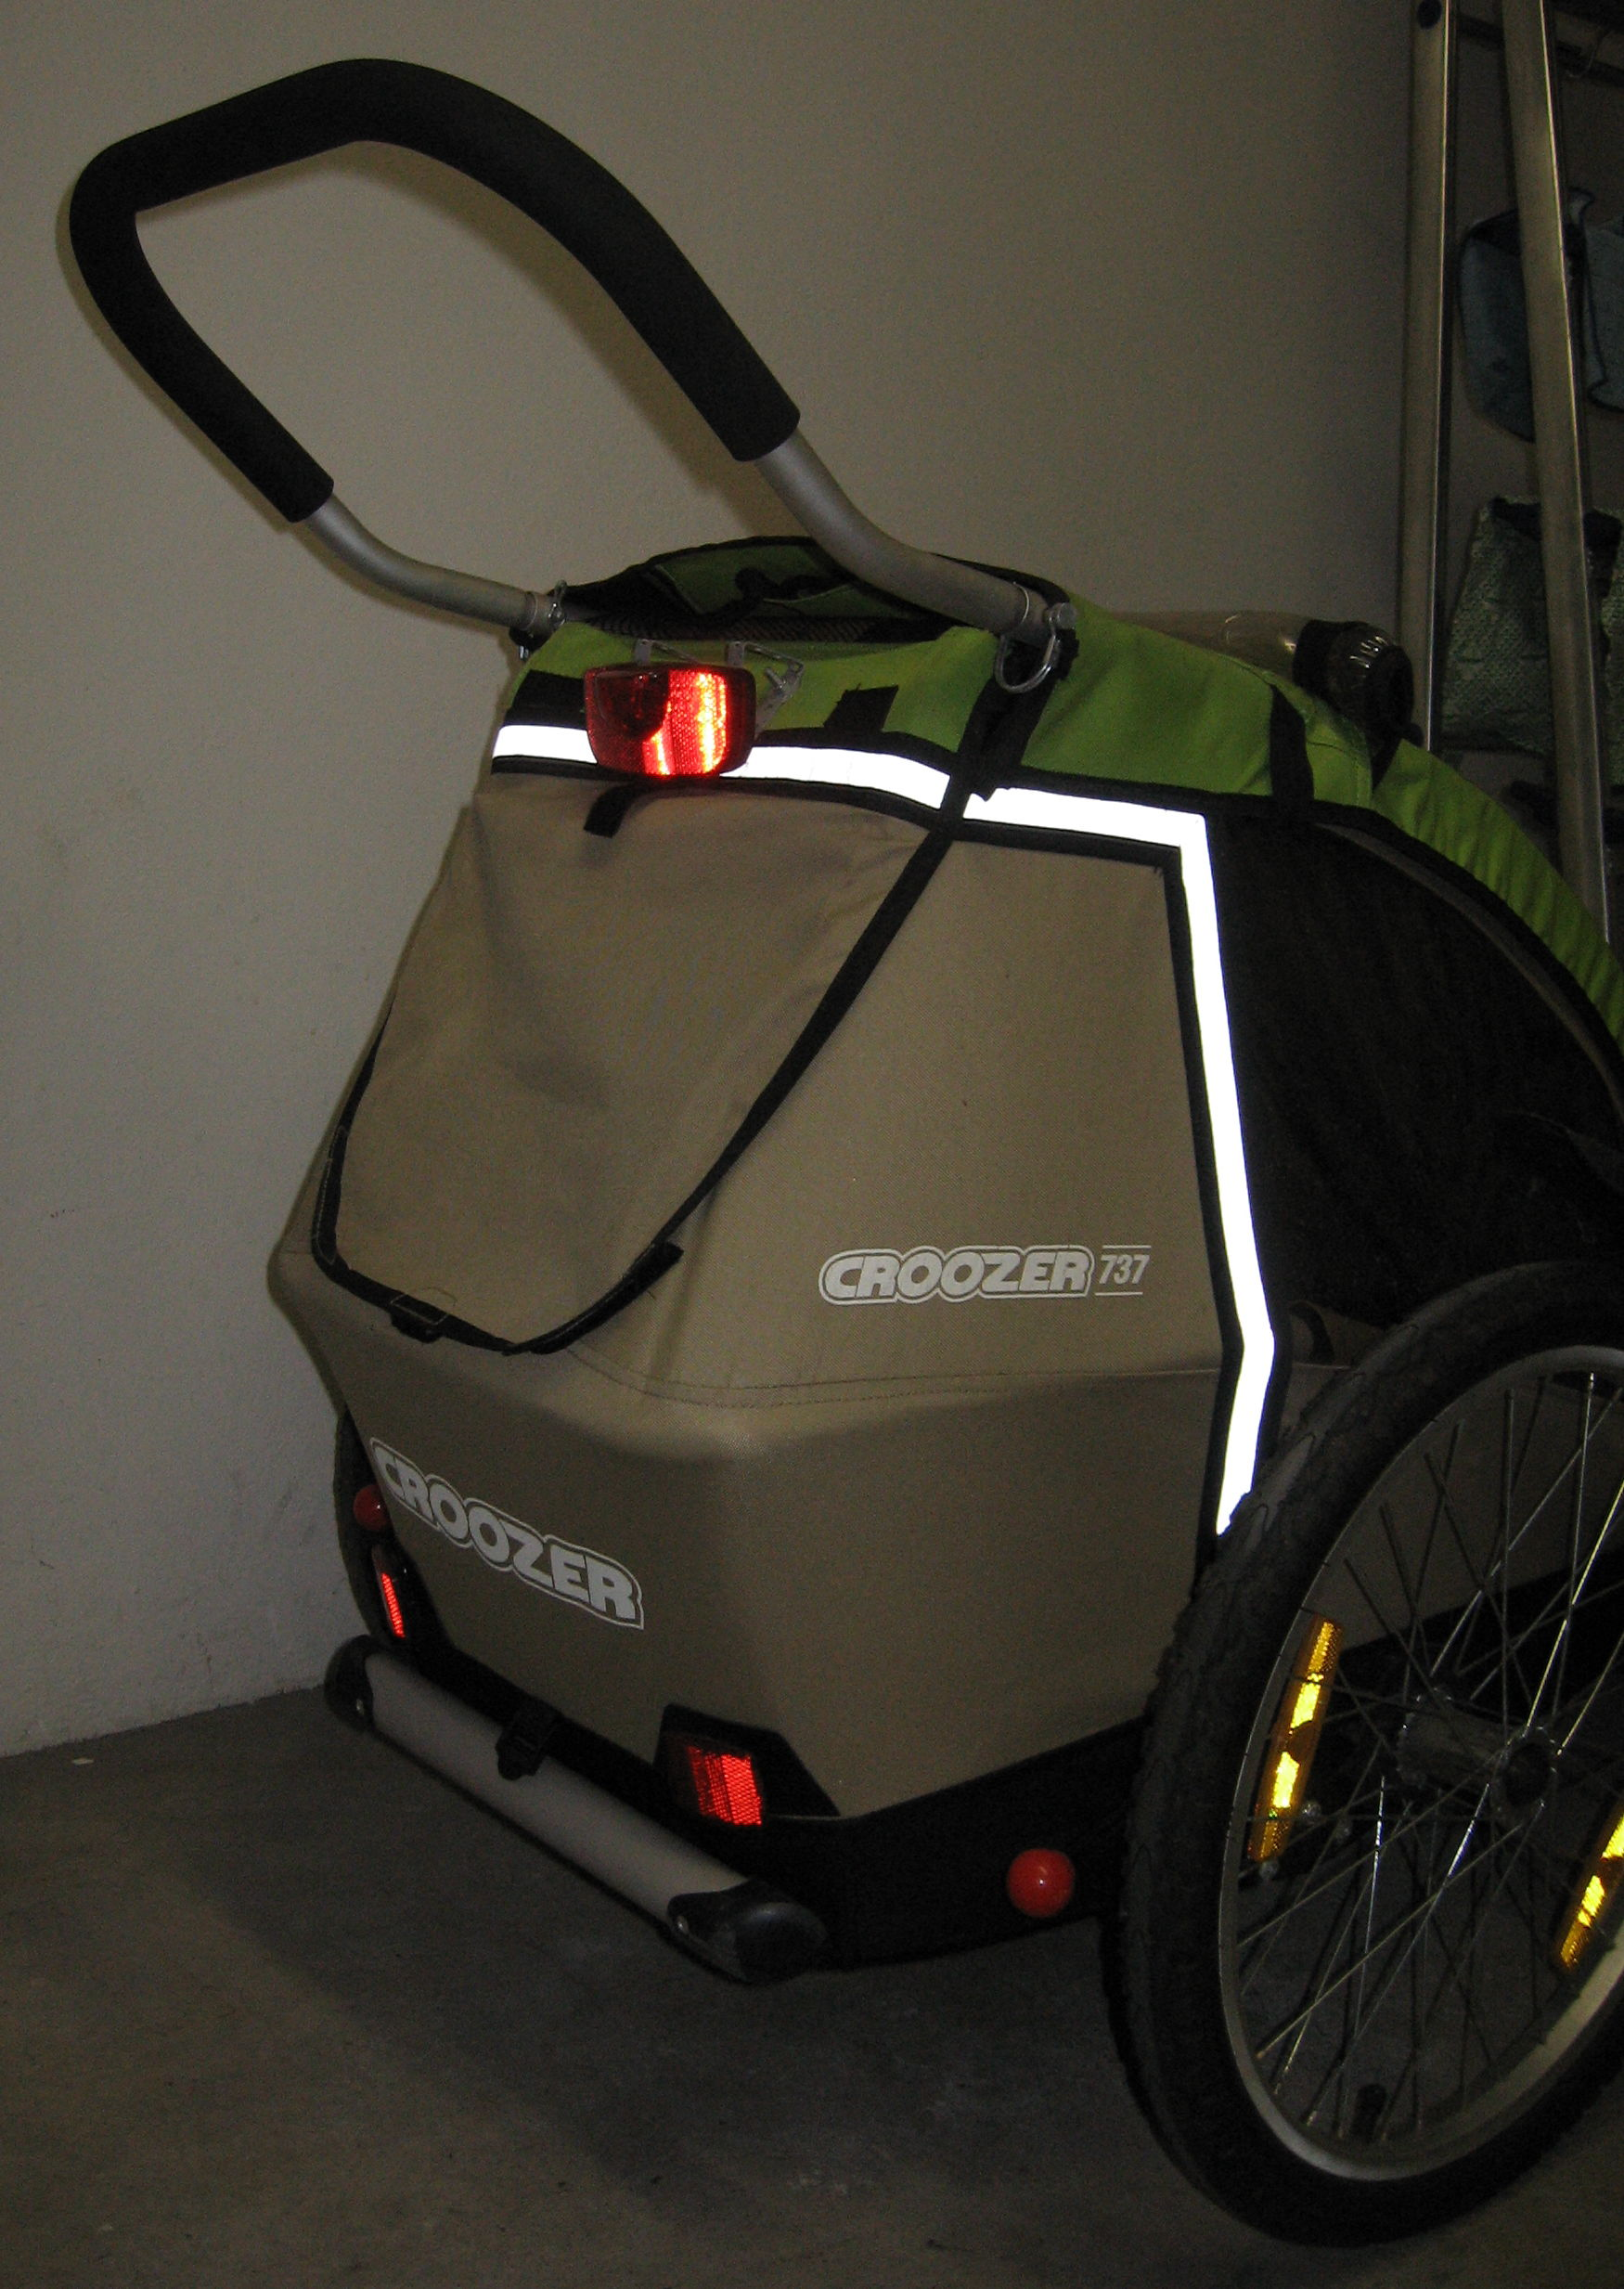 Anhängerbeleuchtung | Fahrrad-Wiki | FANDOM powered by Wikia